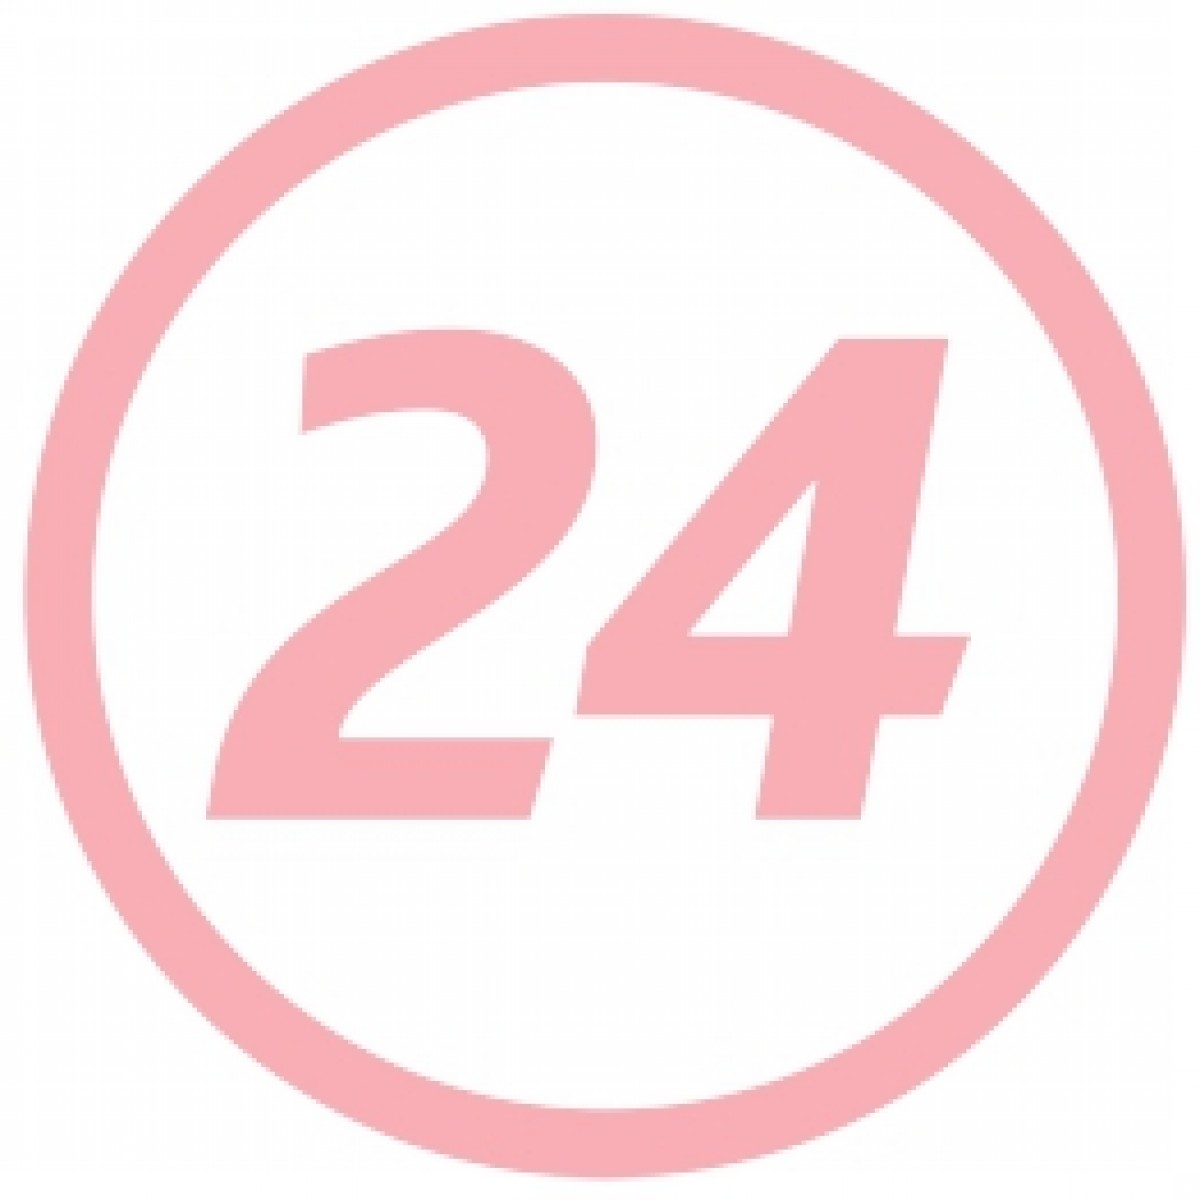 AVENE Cleanance Expert Crema, Tratament Antiacneic, 40ml